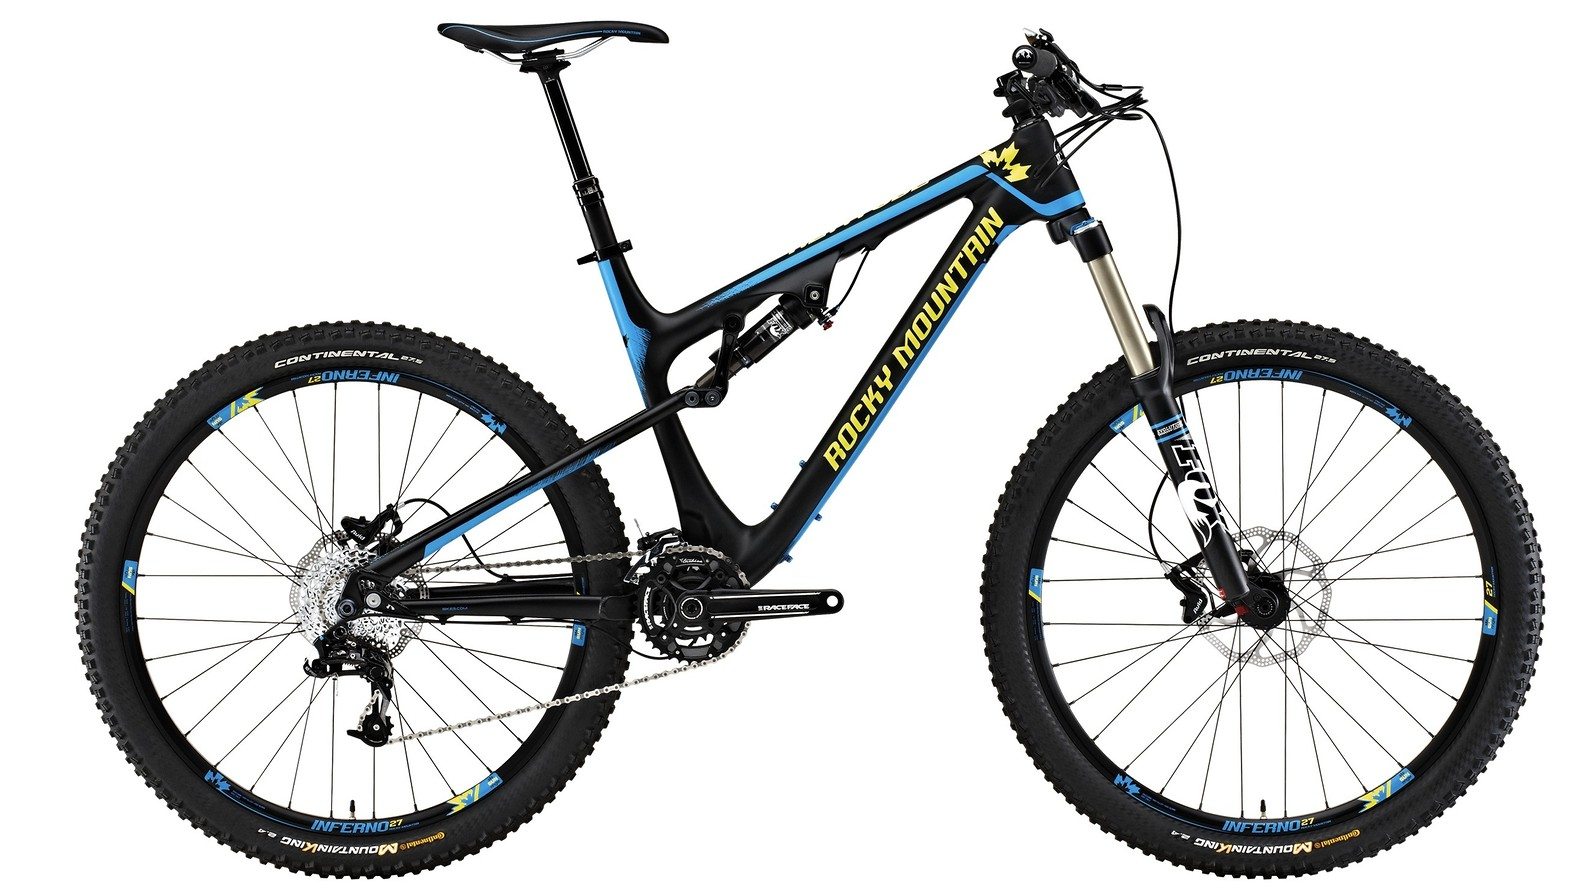 bike - 2014 Rocky Mountain Altitude 750 MSL